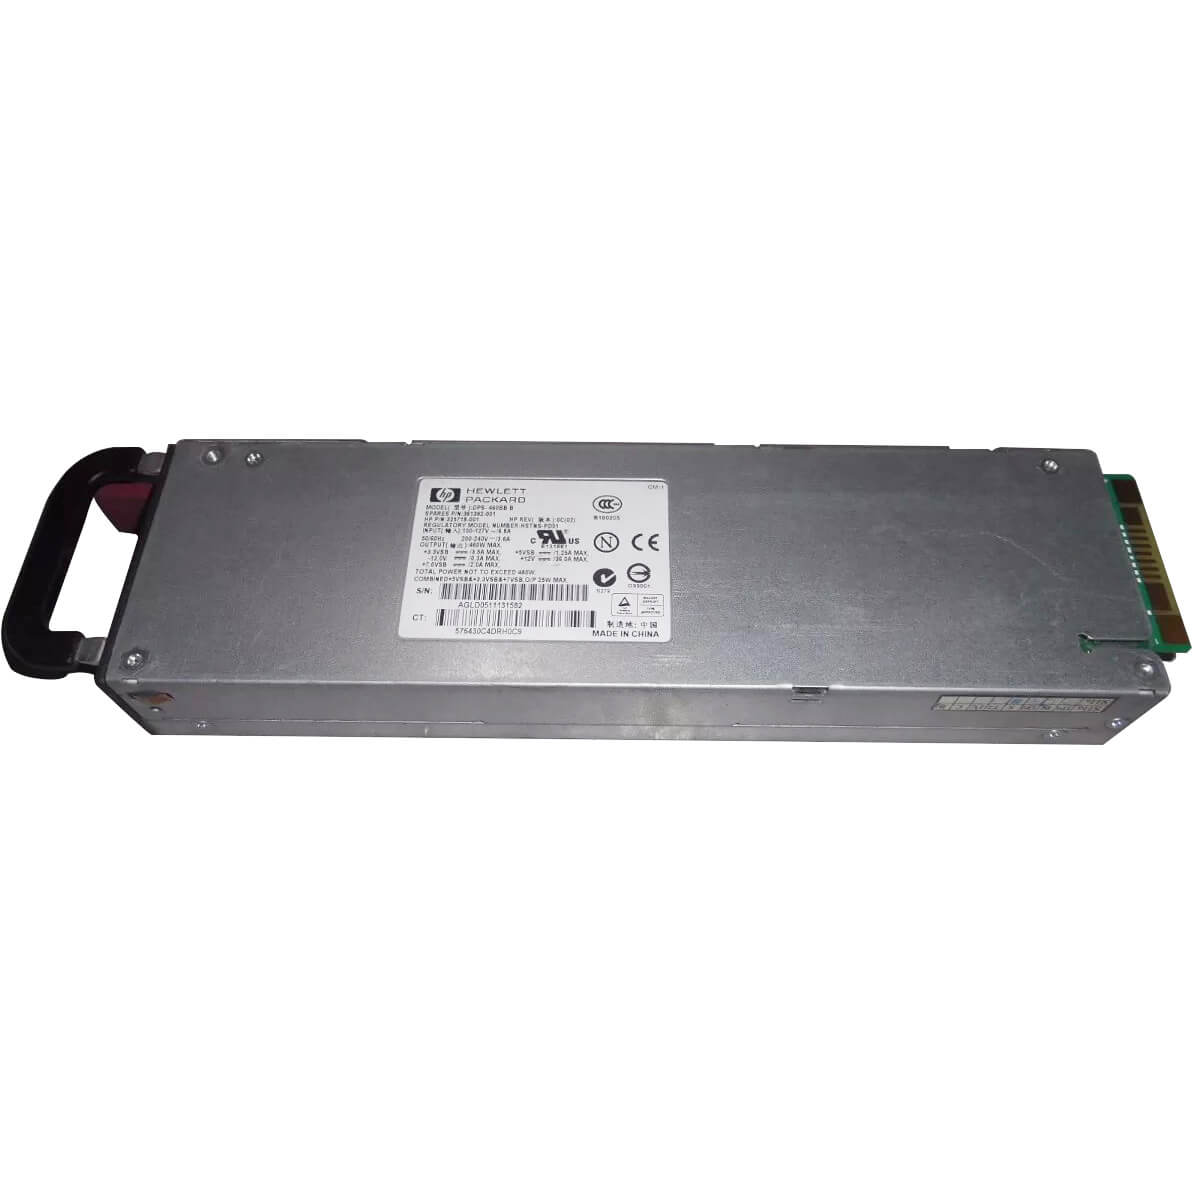 Fonte Servidor HP DL360 G4 460w DPS-460BB 325718-001 361392-001 - Usada